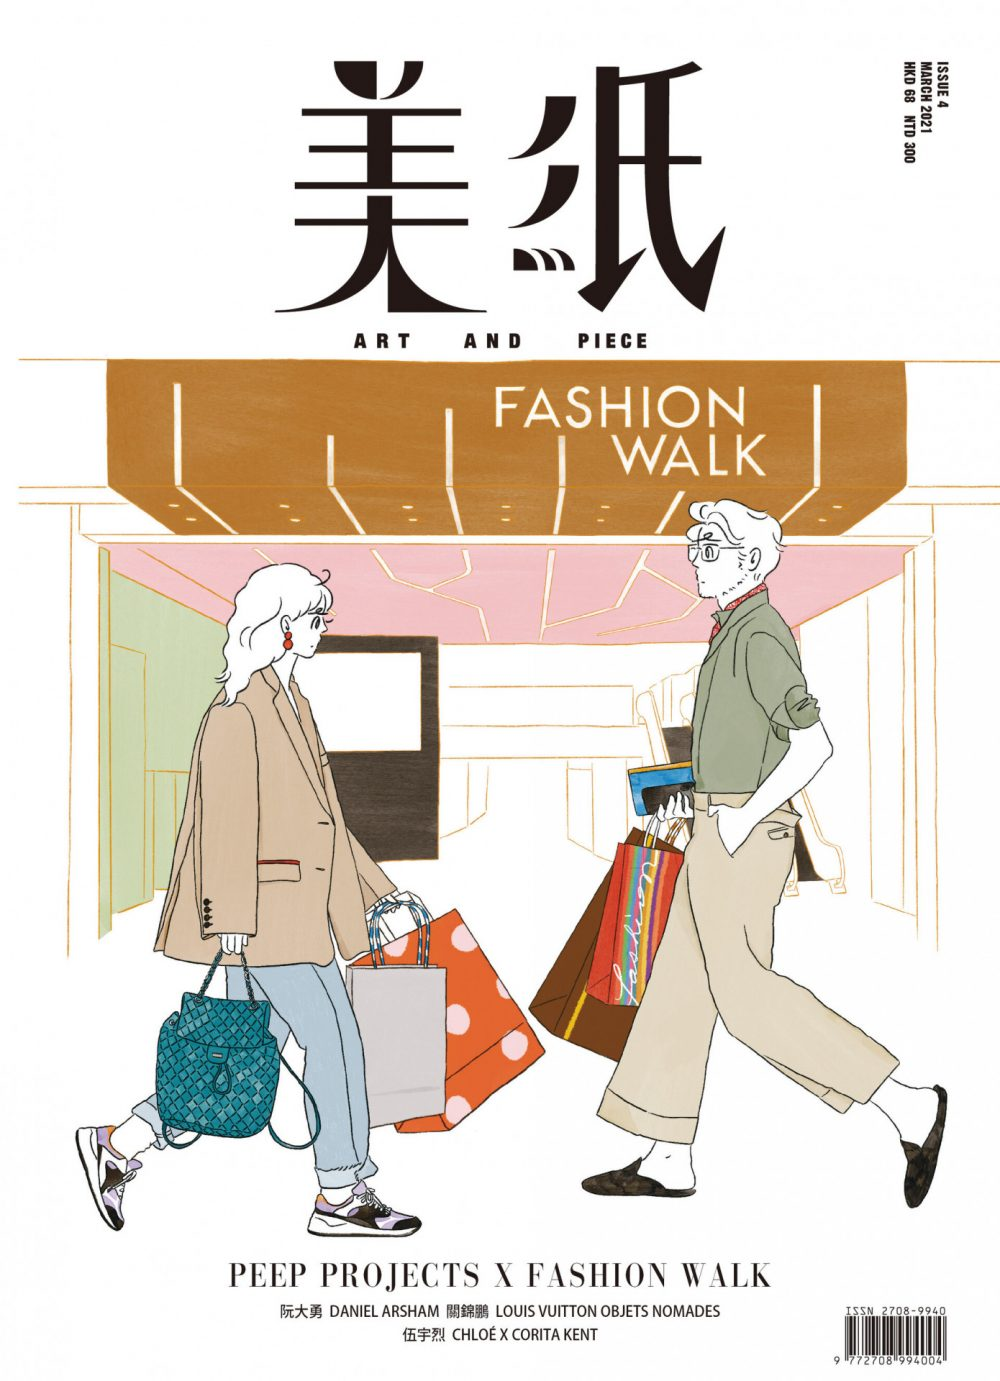 ISSUE 4 – Peep Projects X Fashion Walk